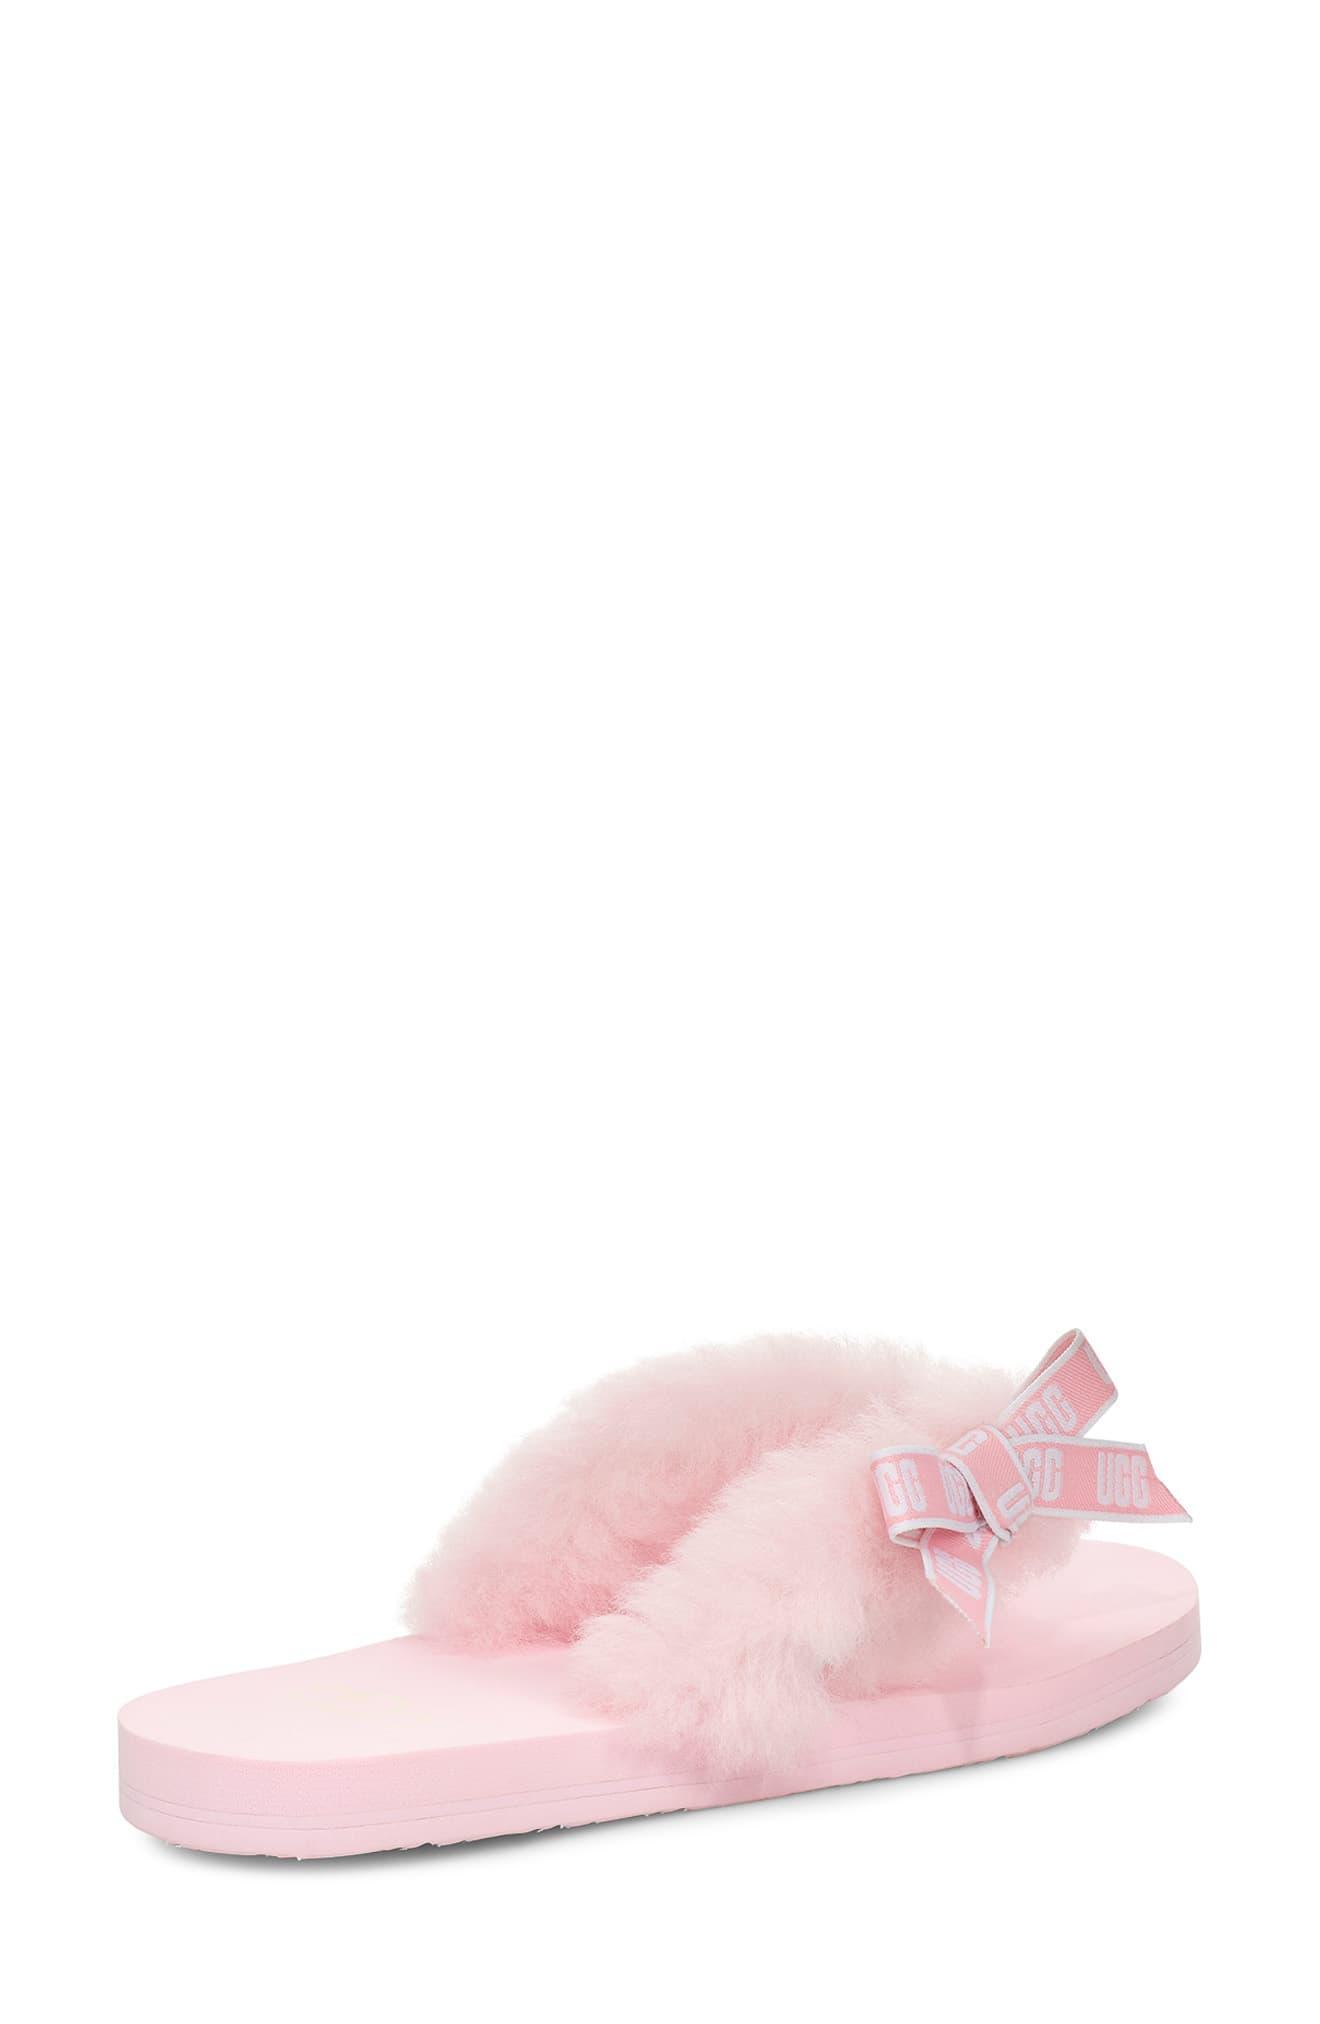 77cb66e85dd Women's Pink Ugg Sunset Graphic Genuine Shearling Flip Flop